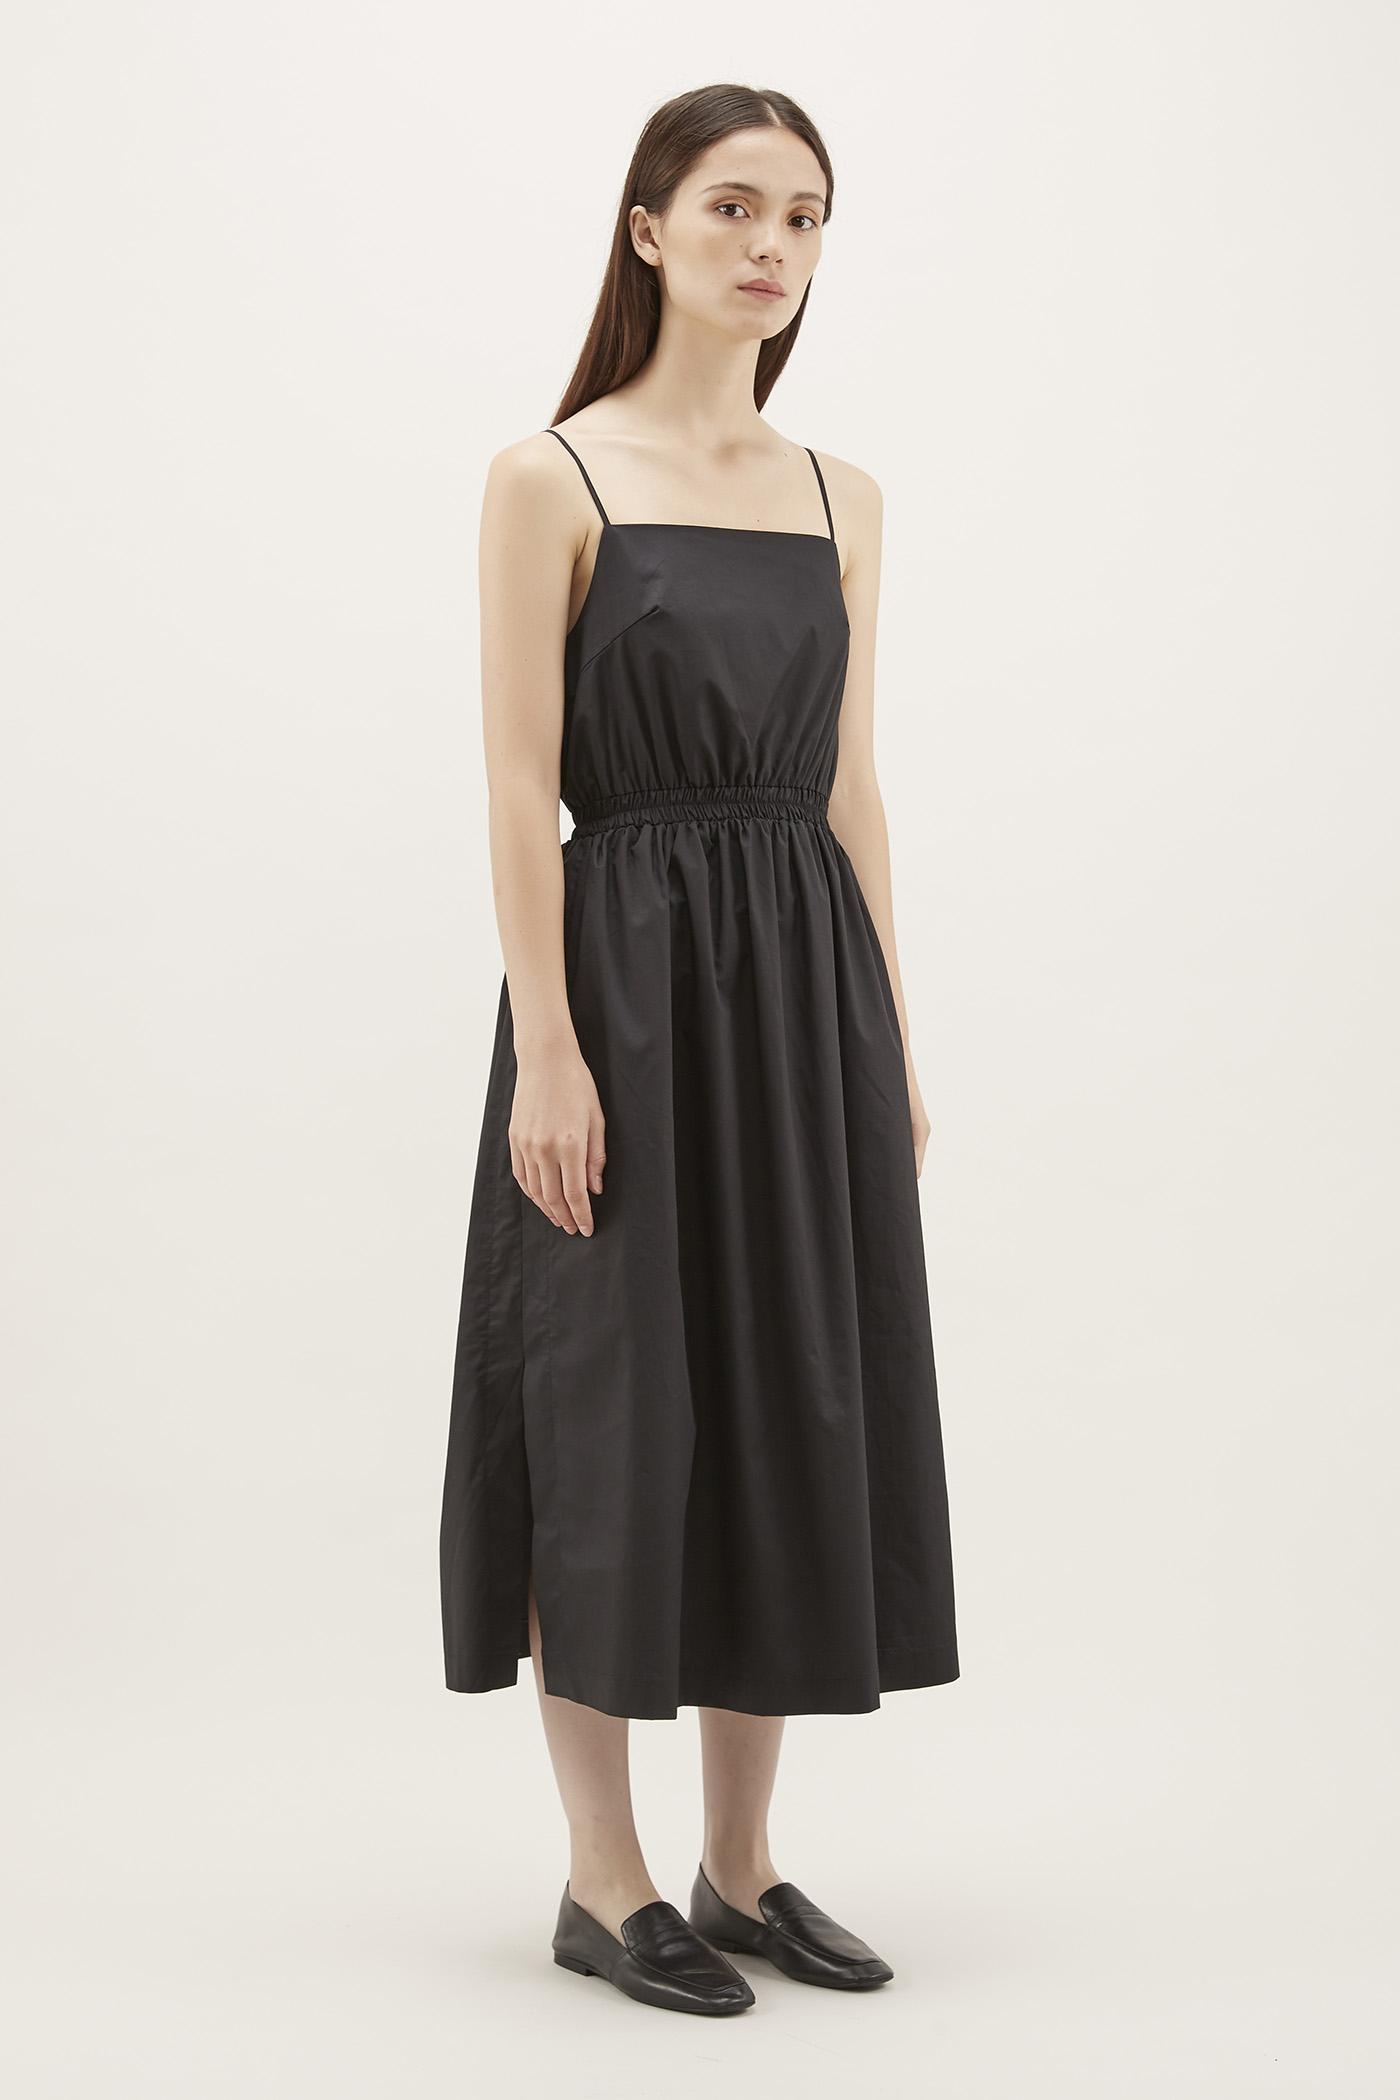 Niese Cinched-waist Dress